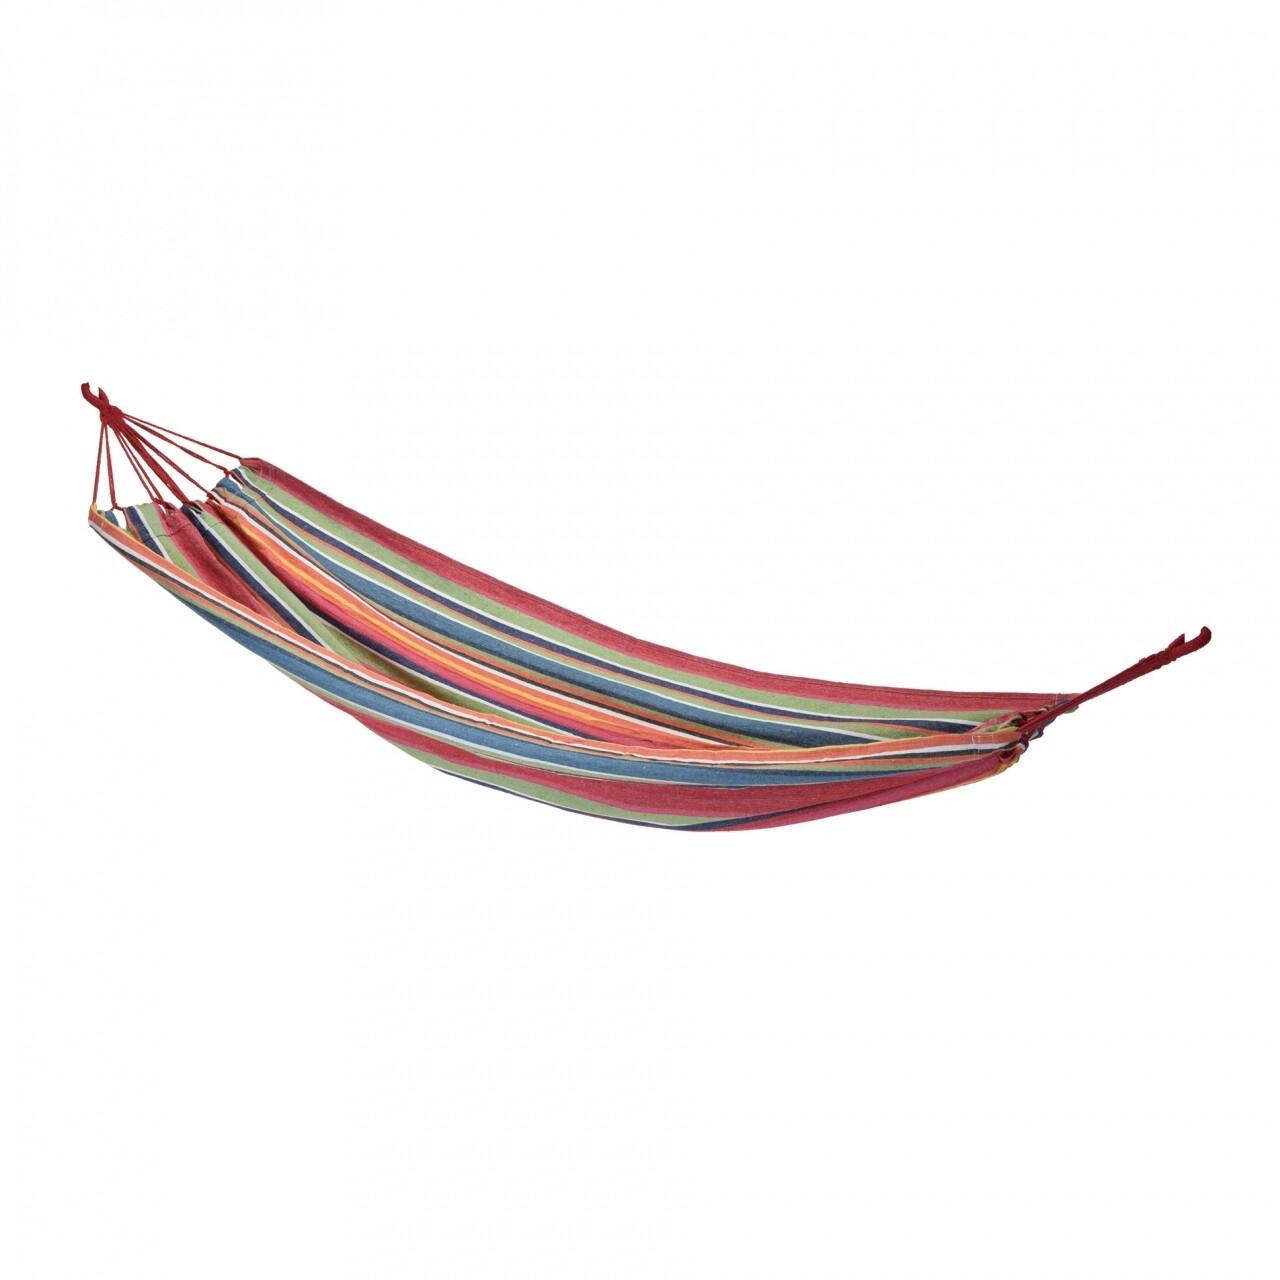 Hamac Comfy, 200 x 100 cm, 60% bumbac si 40% poliester, multicolor